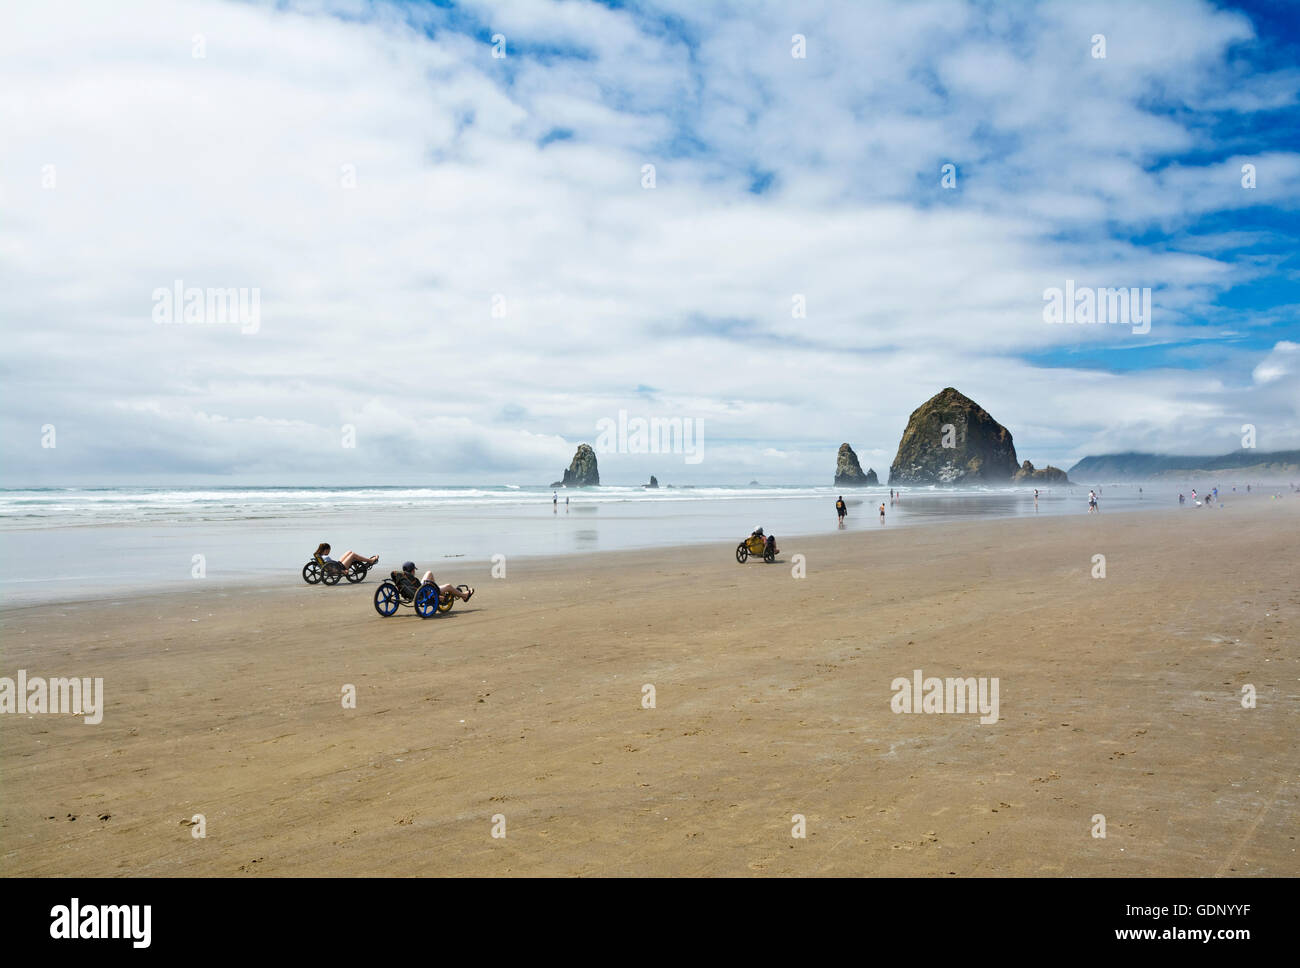 people-riding-recumbent-beach-bikes-near